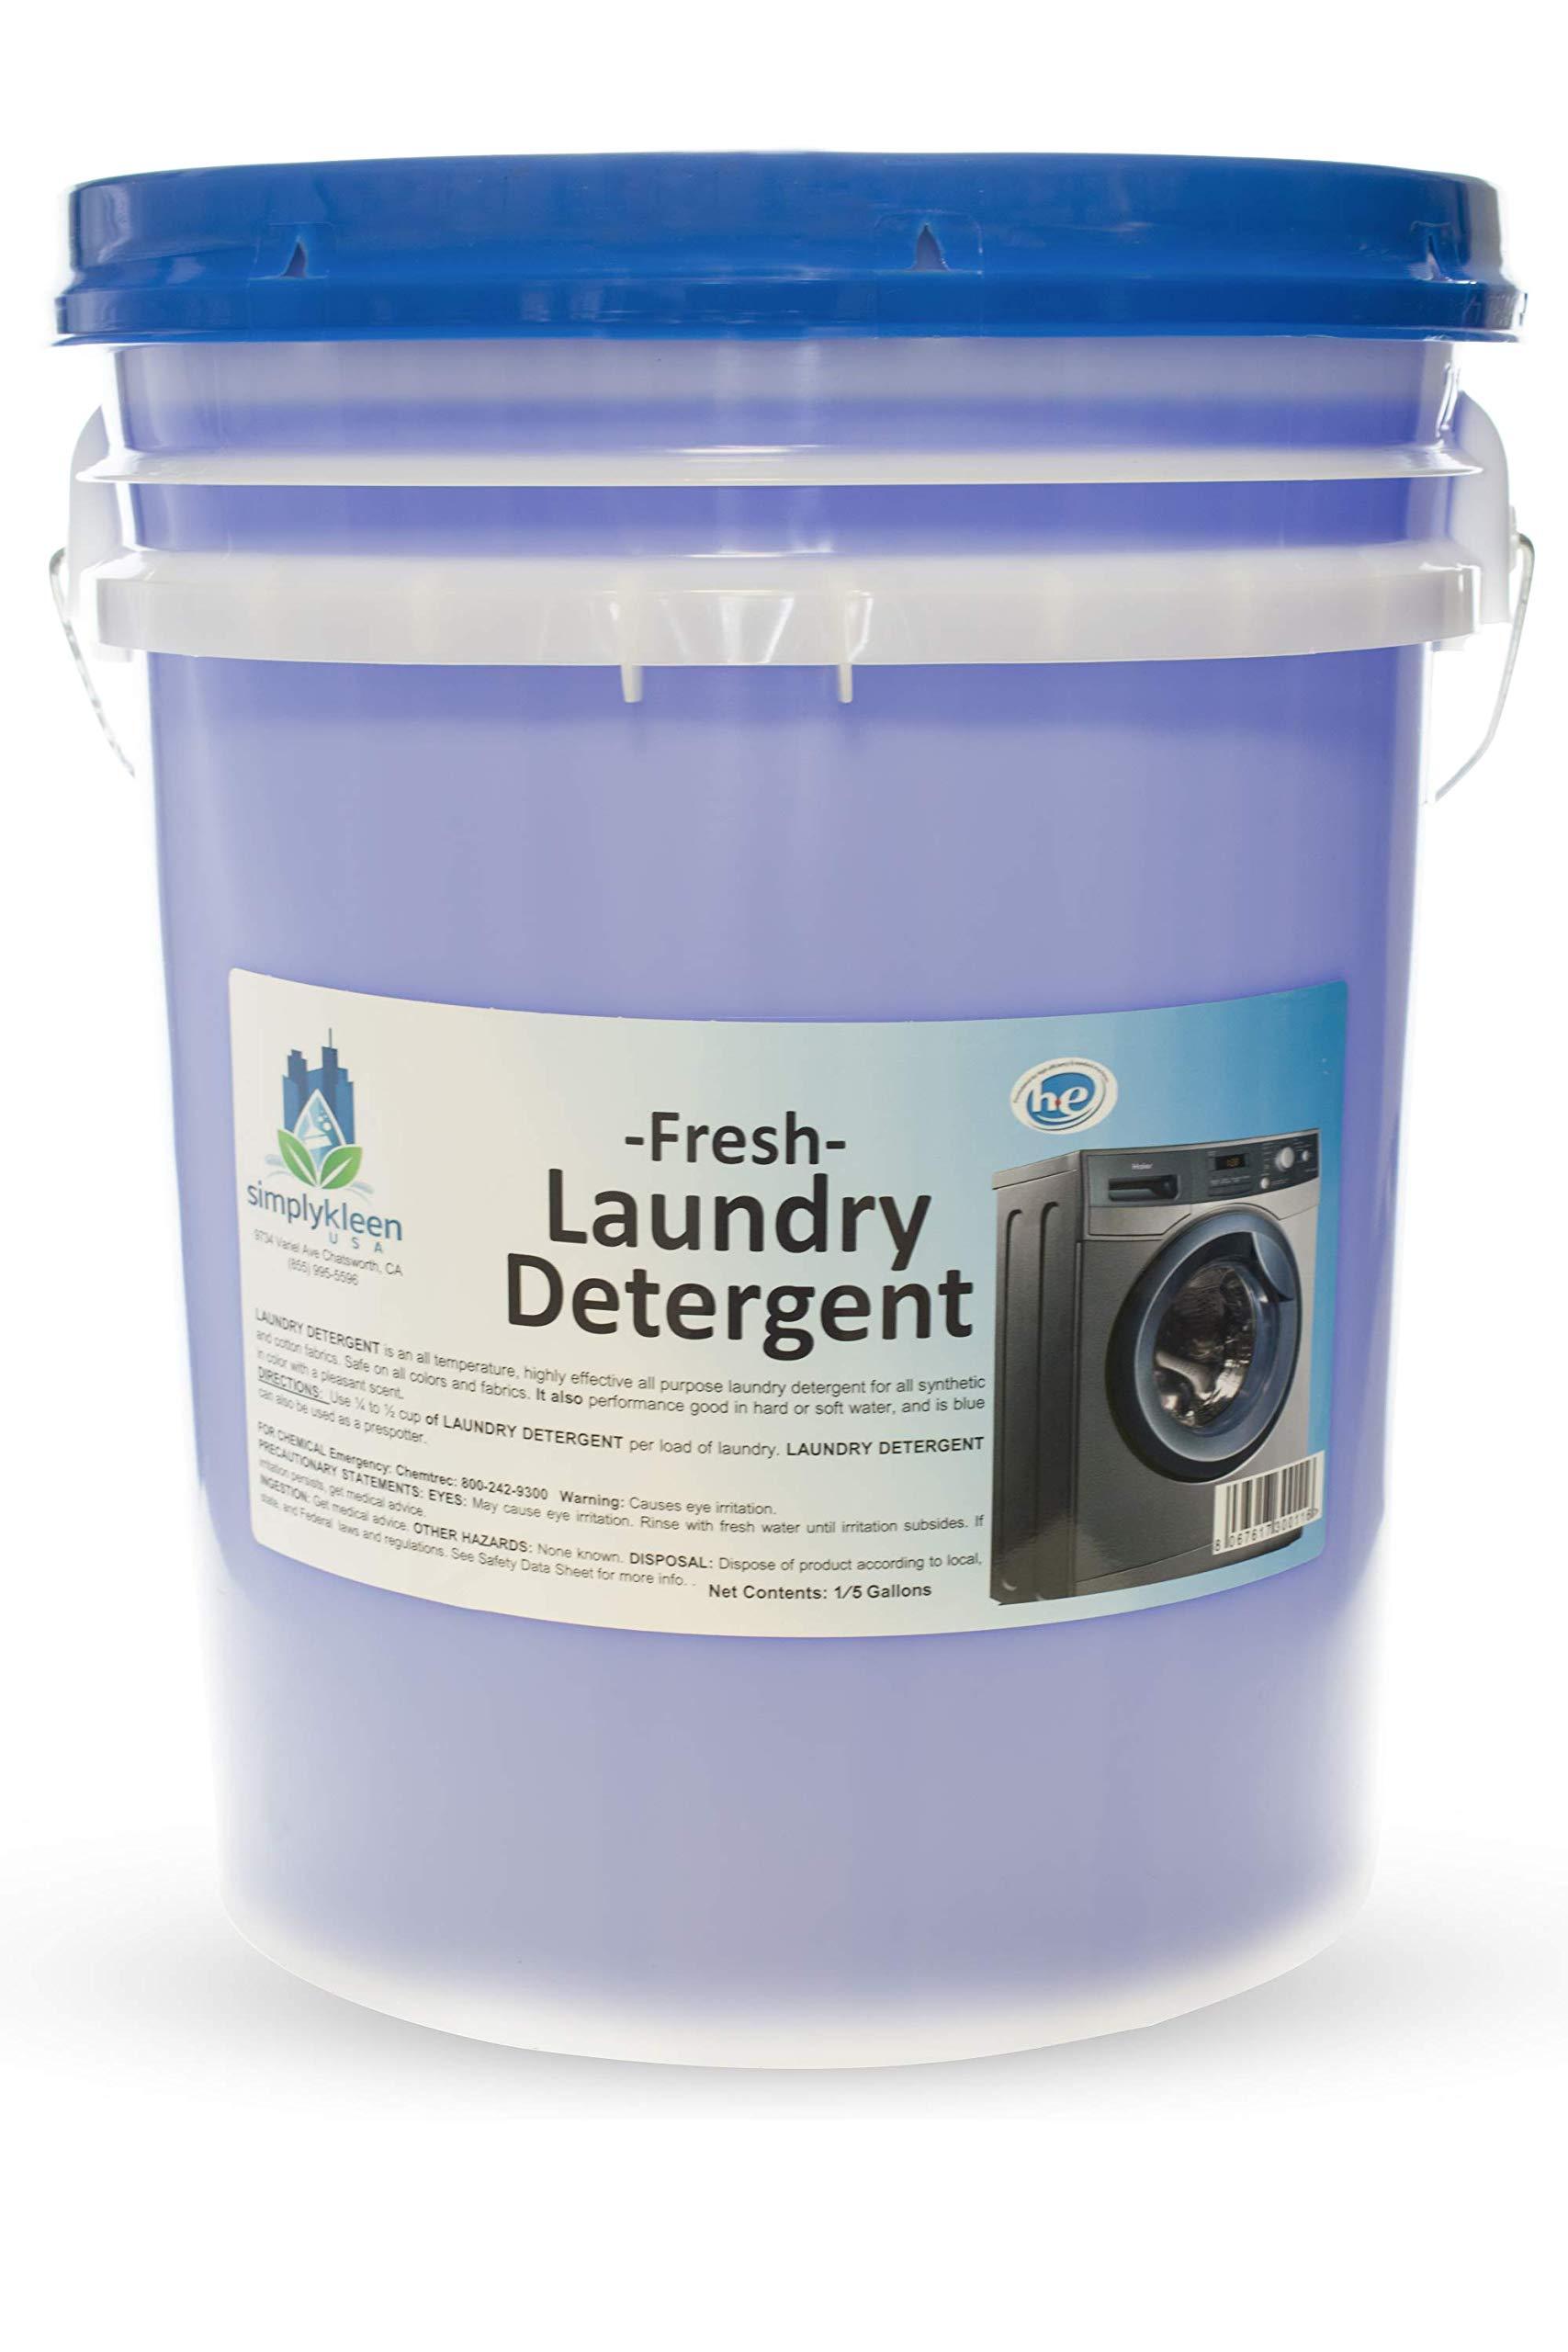 Simply Kleen Professional Multipurpose Liquid Detergent, 5 Gallon Pail, 426 Loads